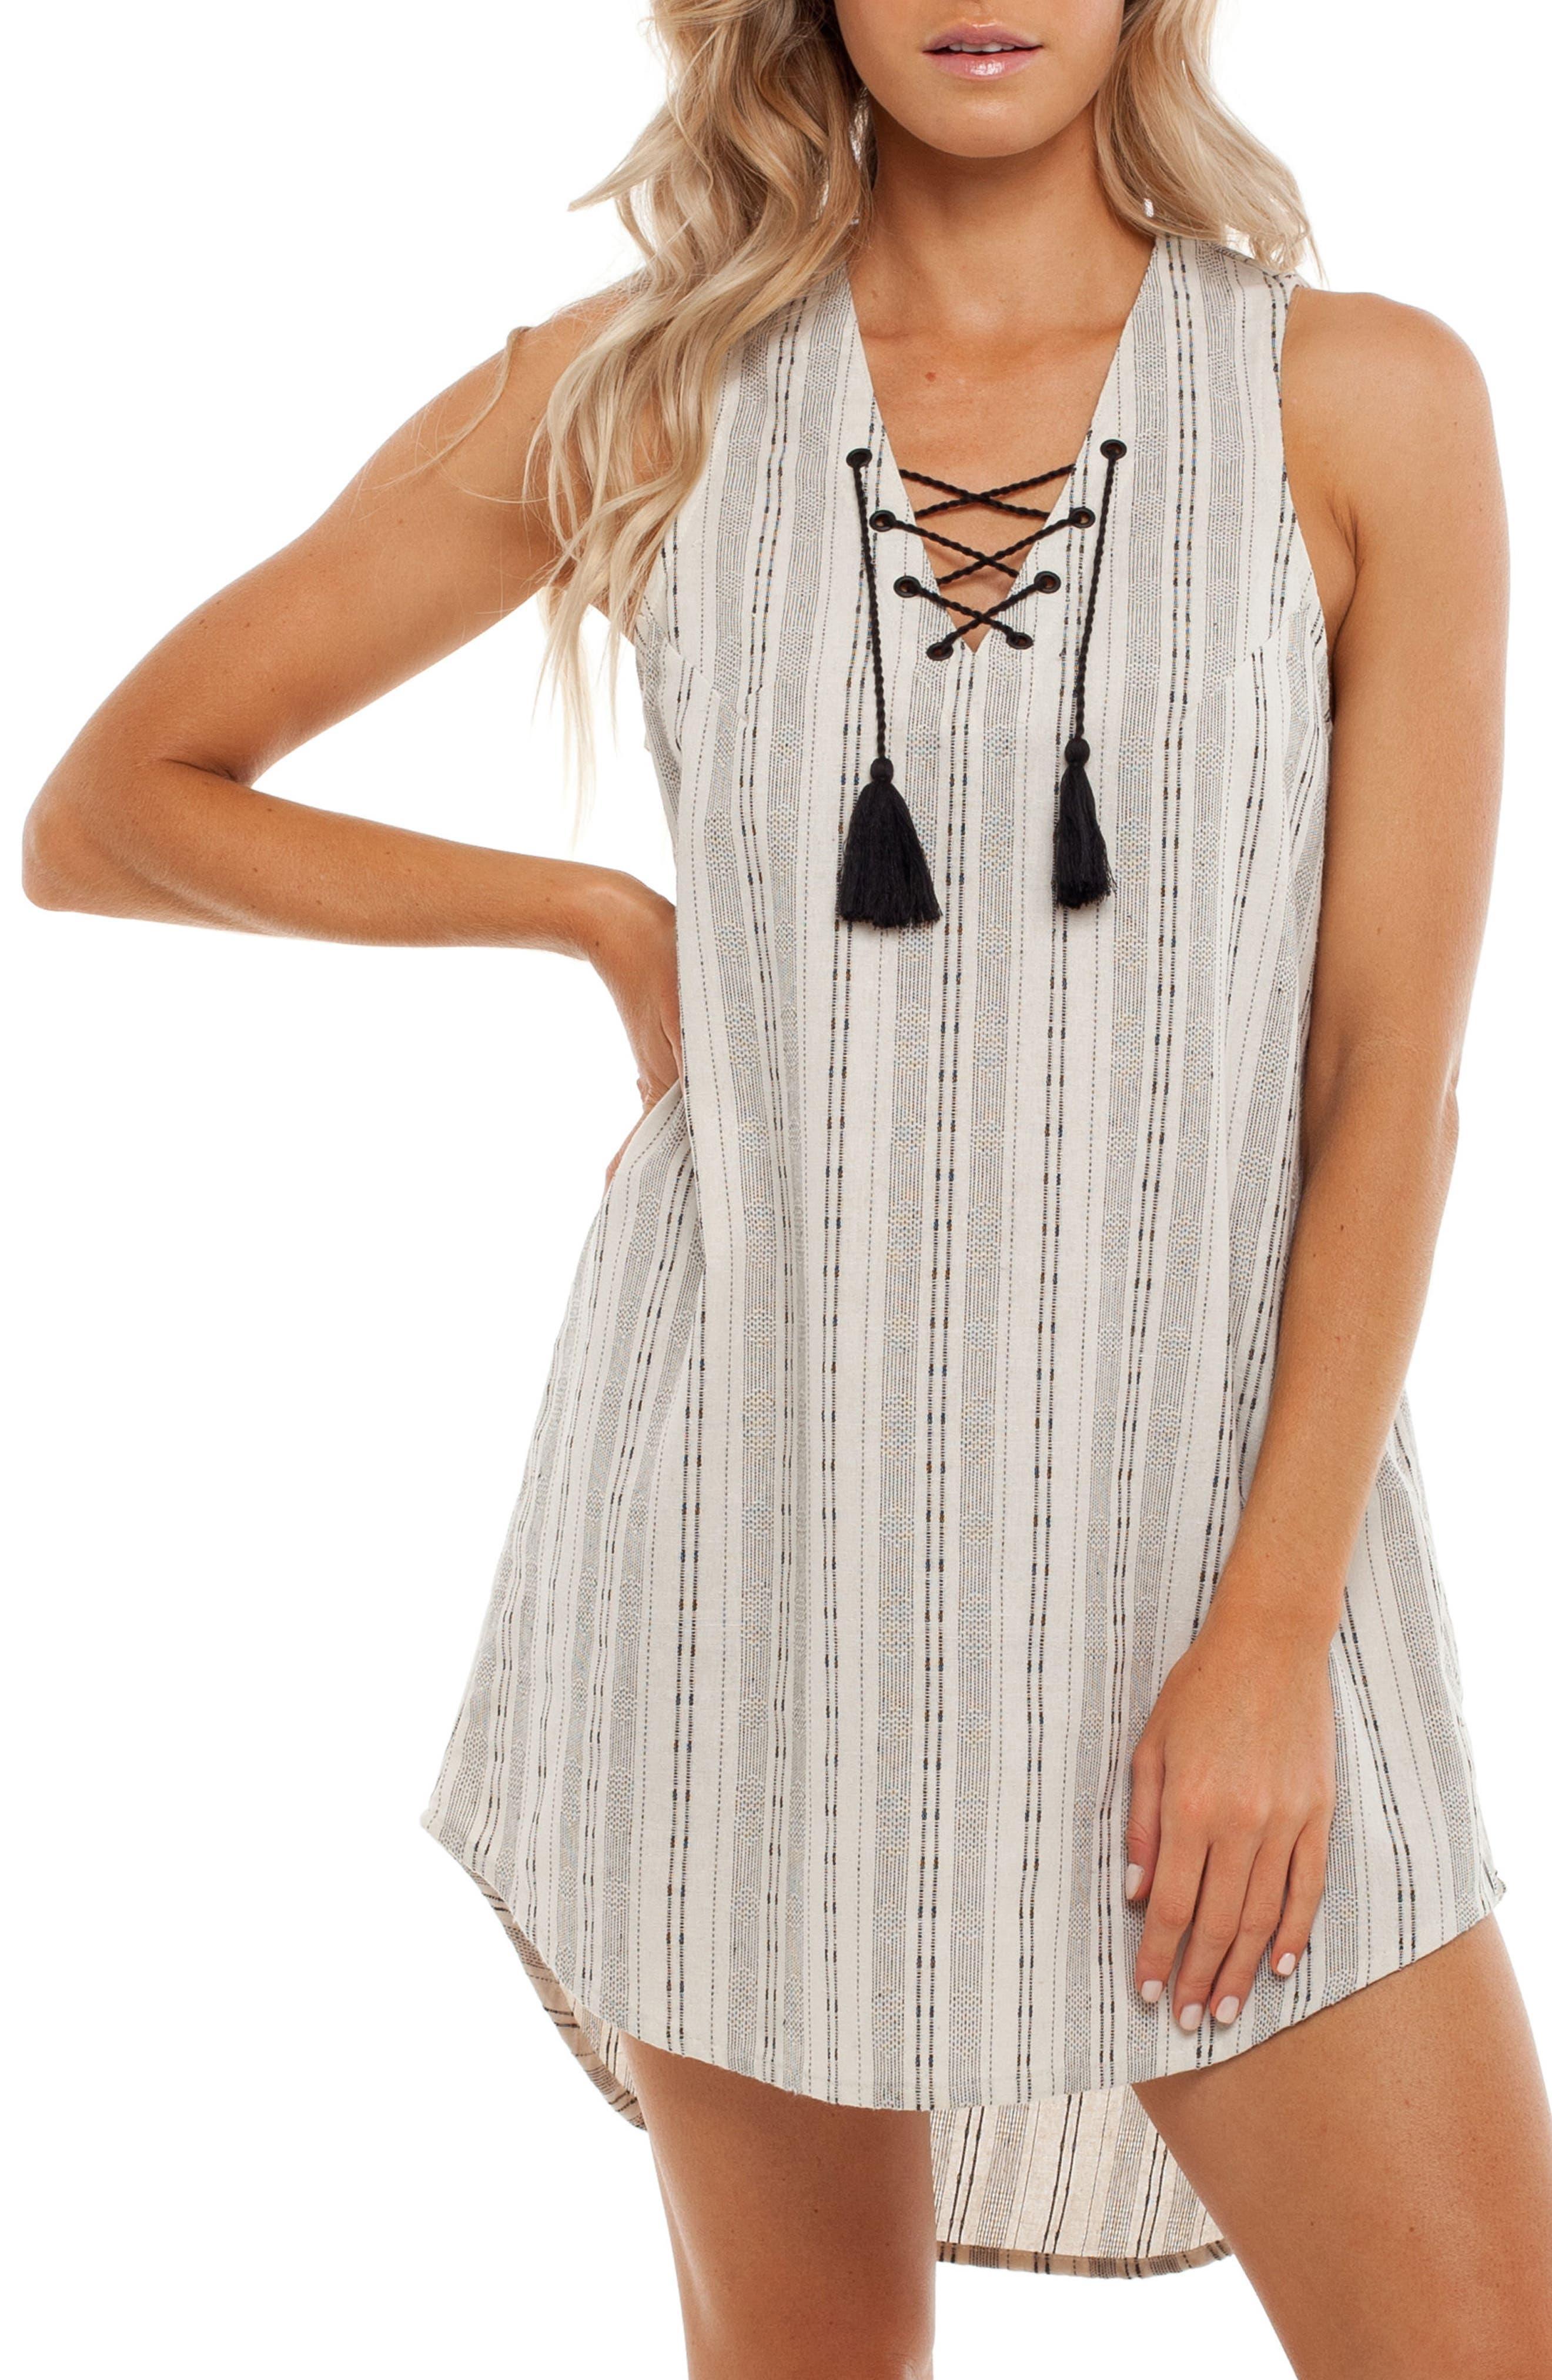 Panama Cover-Up Dress,                             Main thumbnail 1, color,                             White